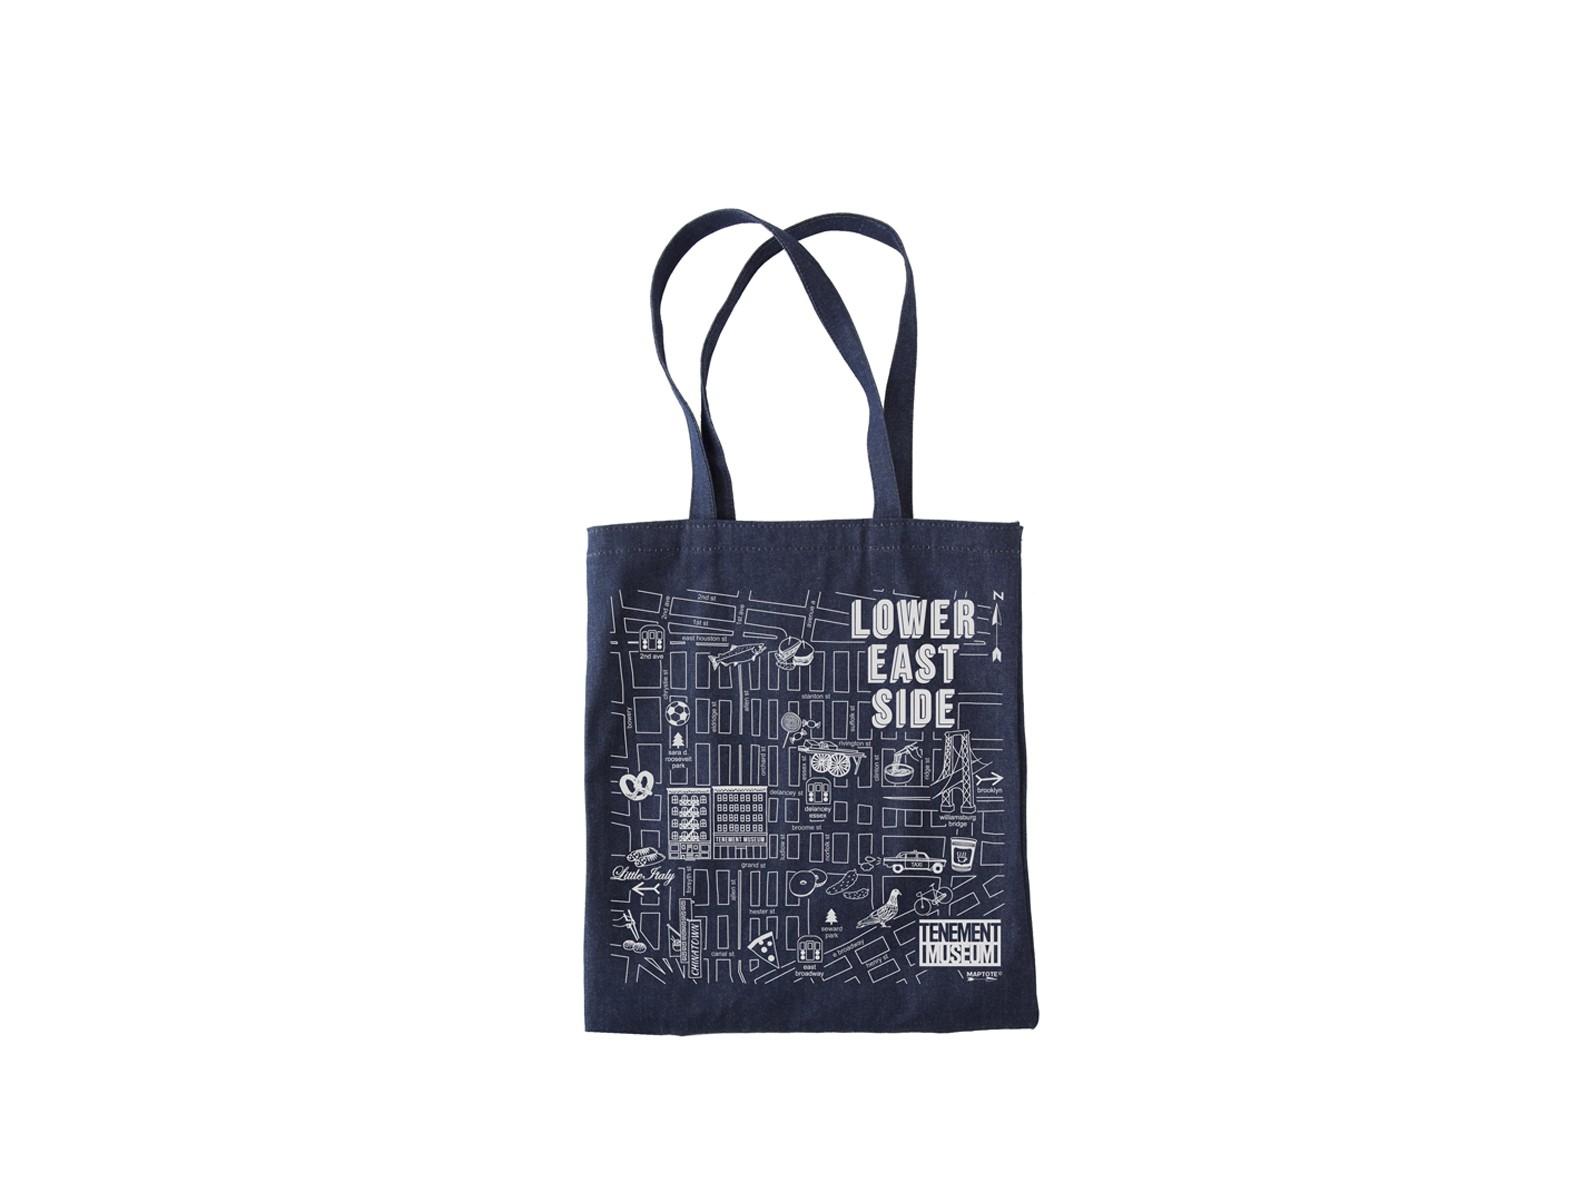 Lower East Side themed denim tote bag